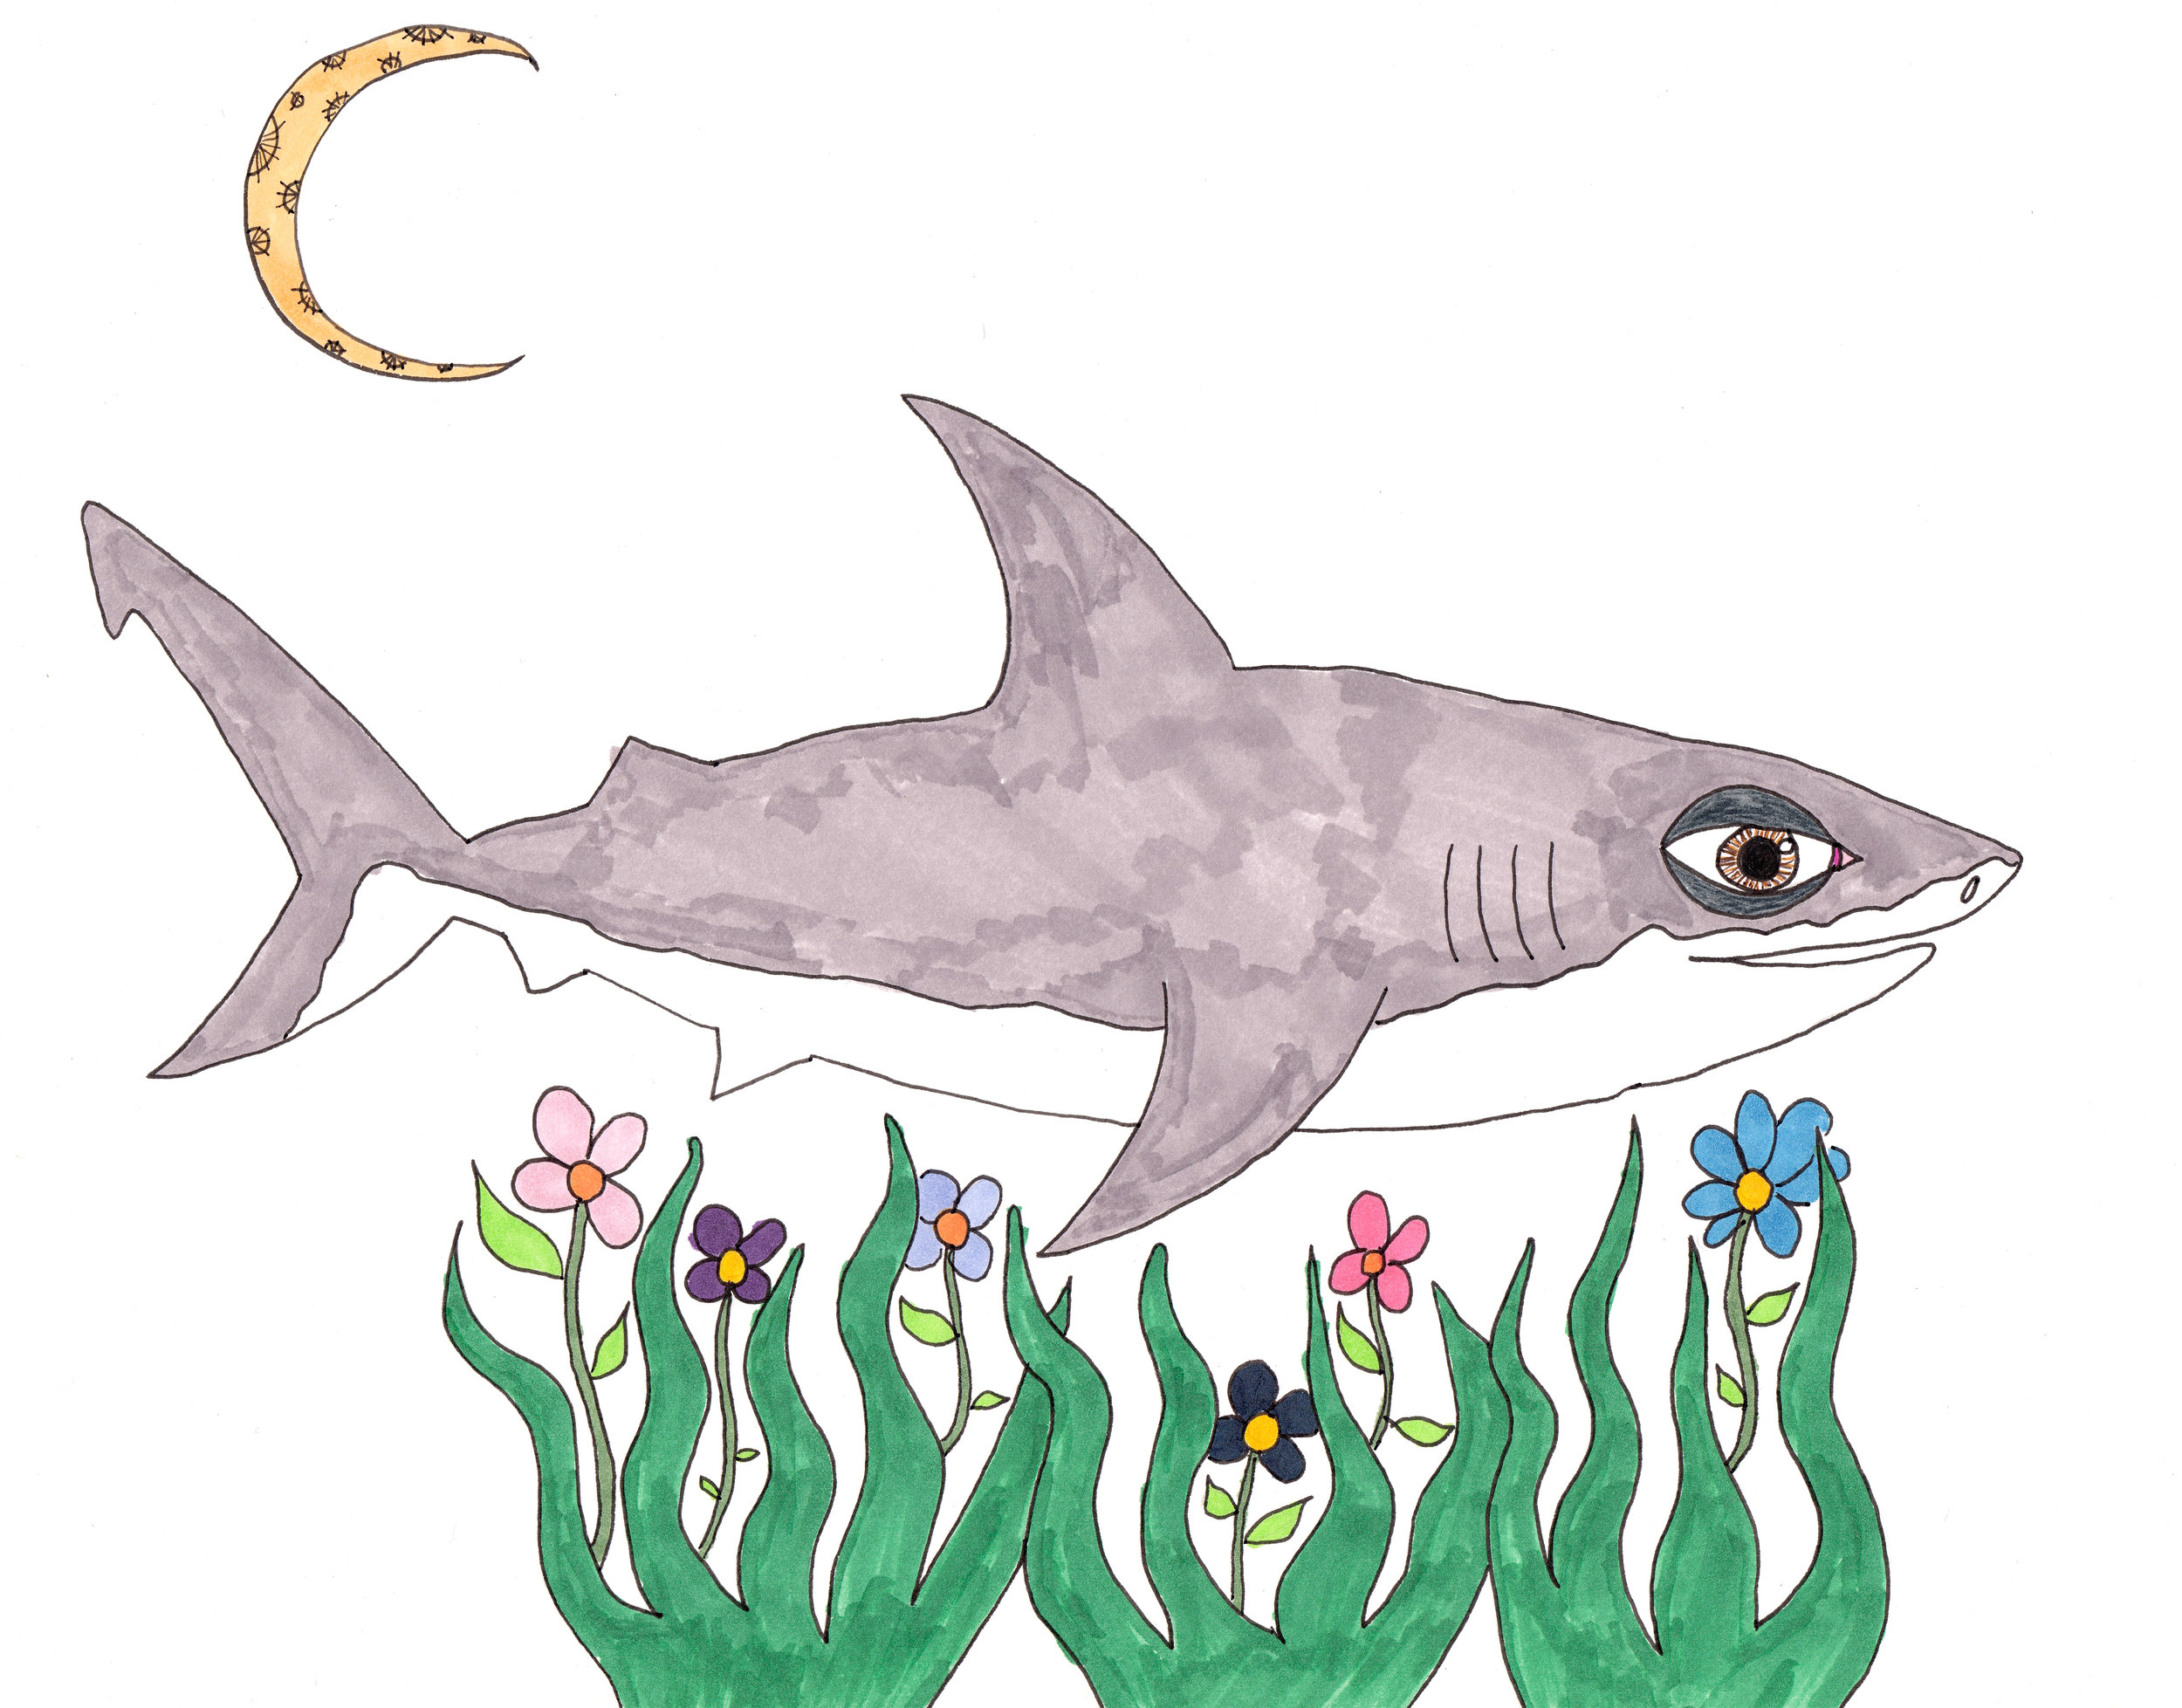 Shark for grant crop .jpg